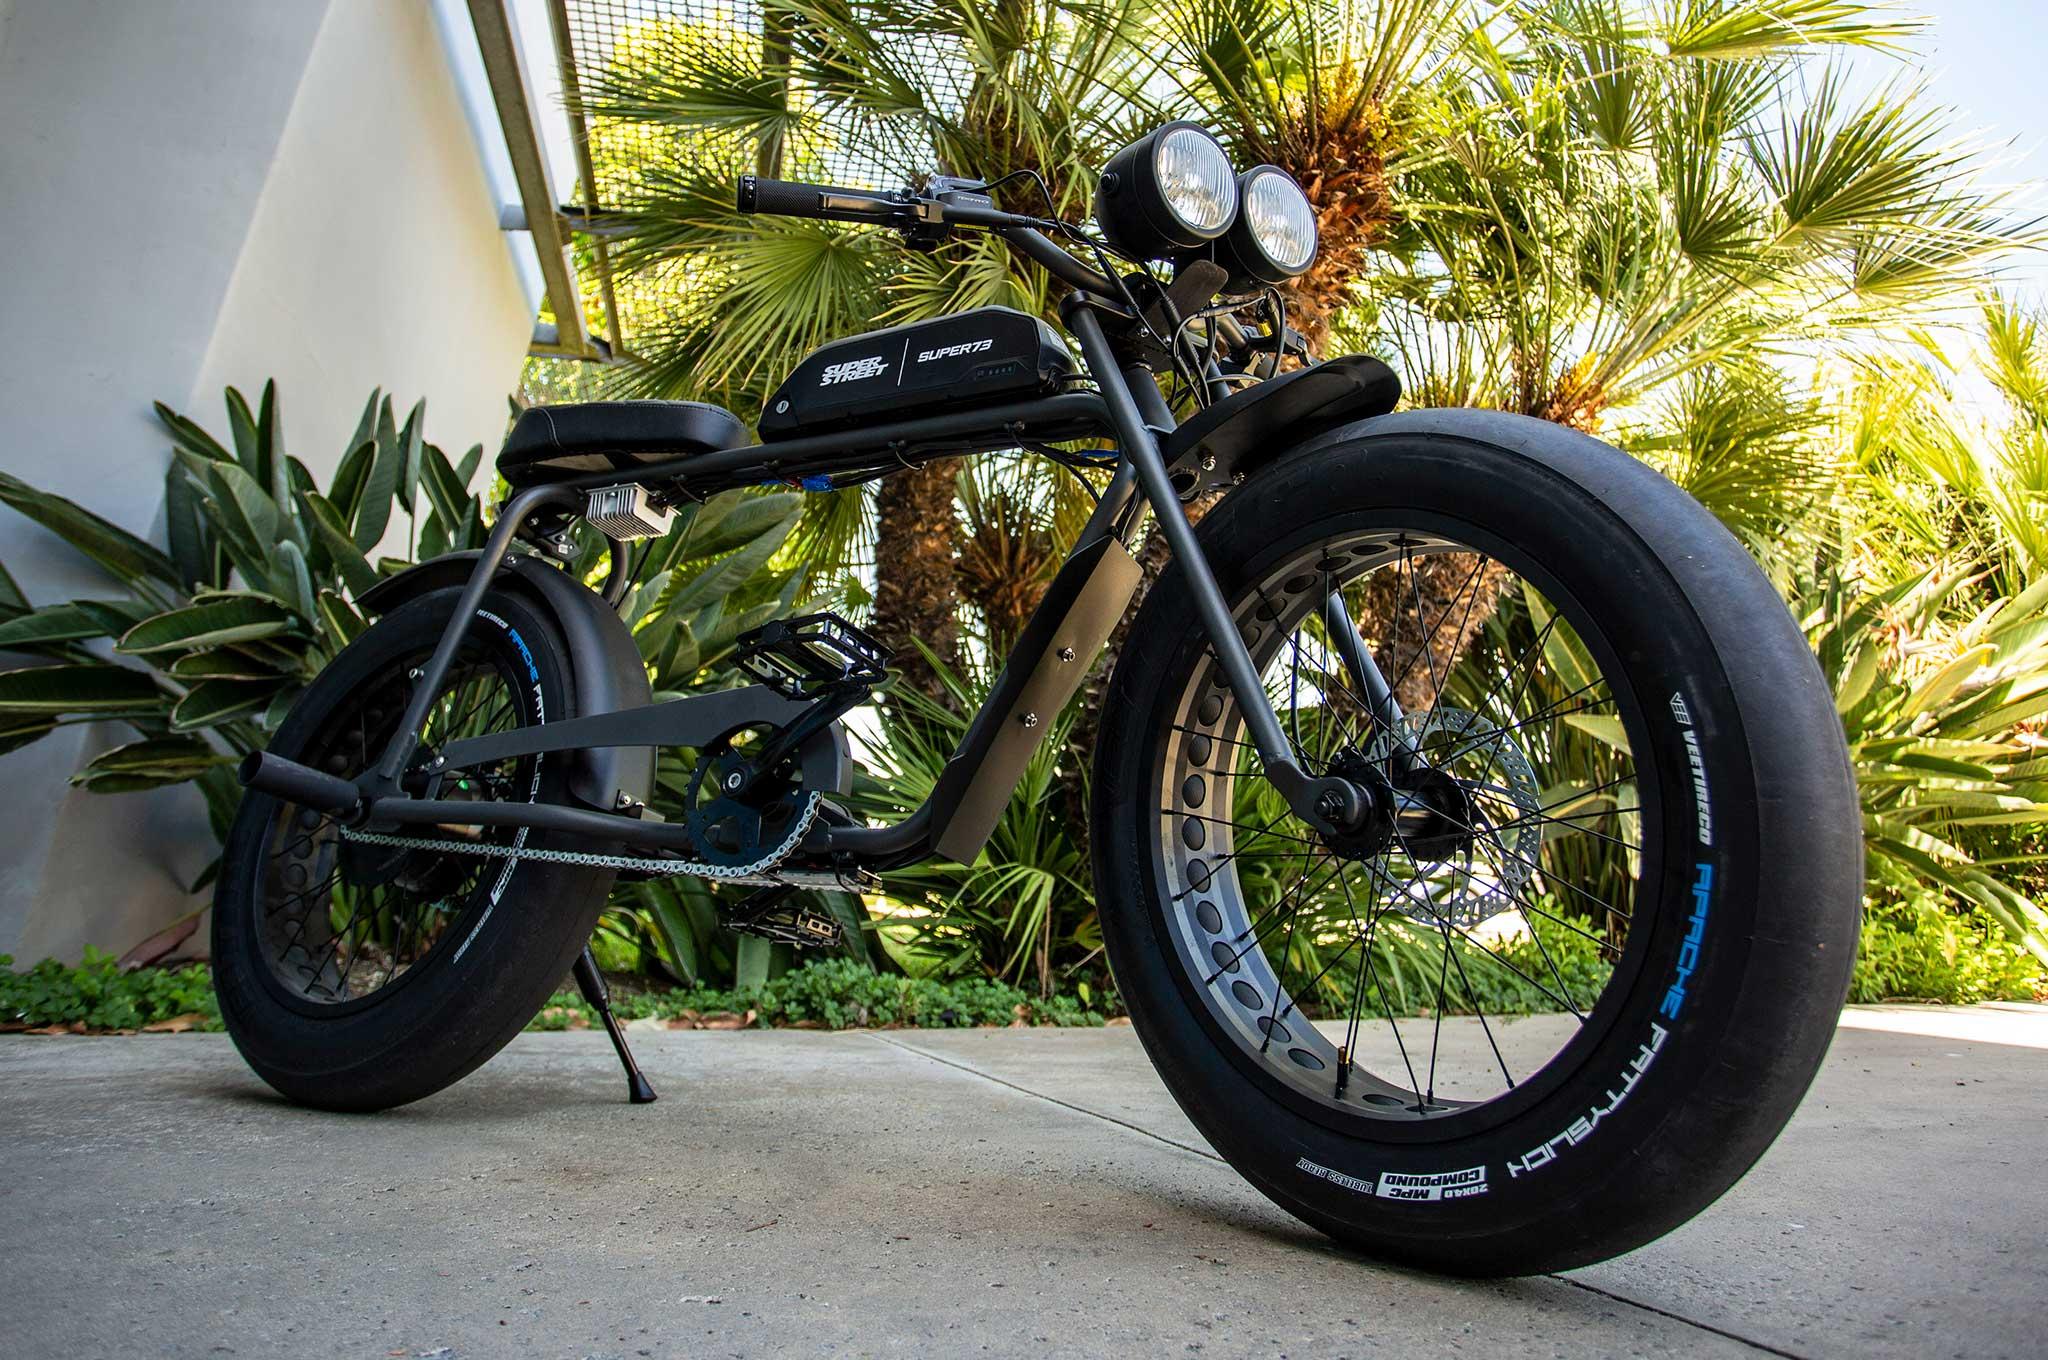 Super73 Electric Bike Cafe Racer Collab